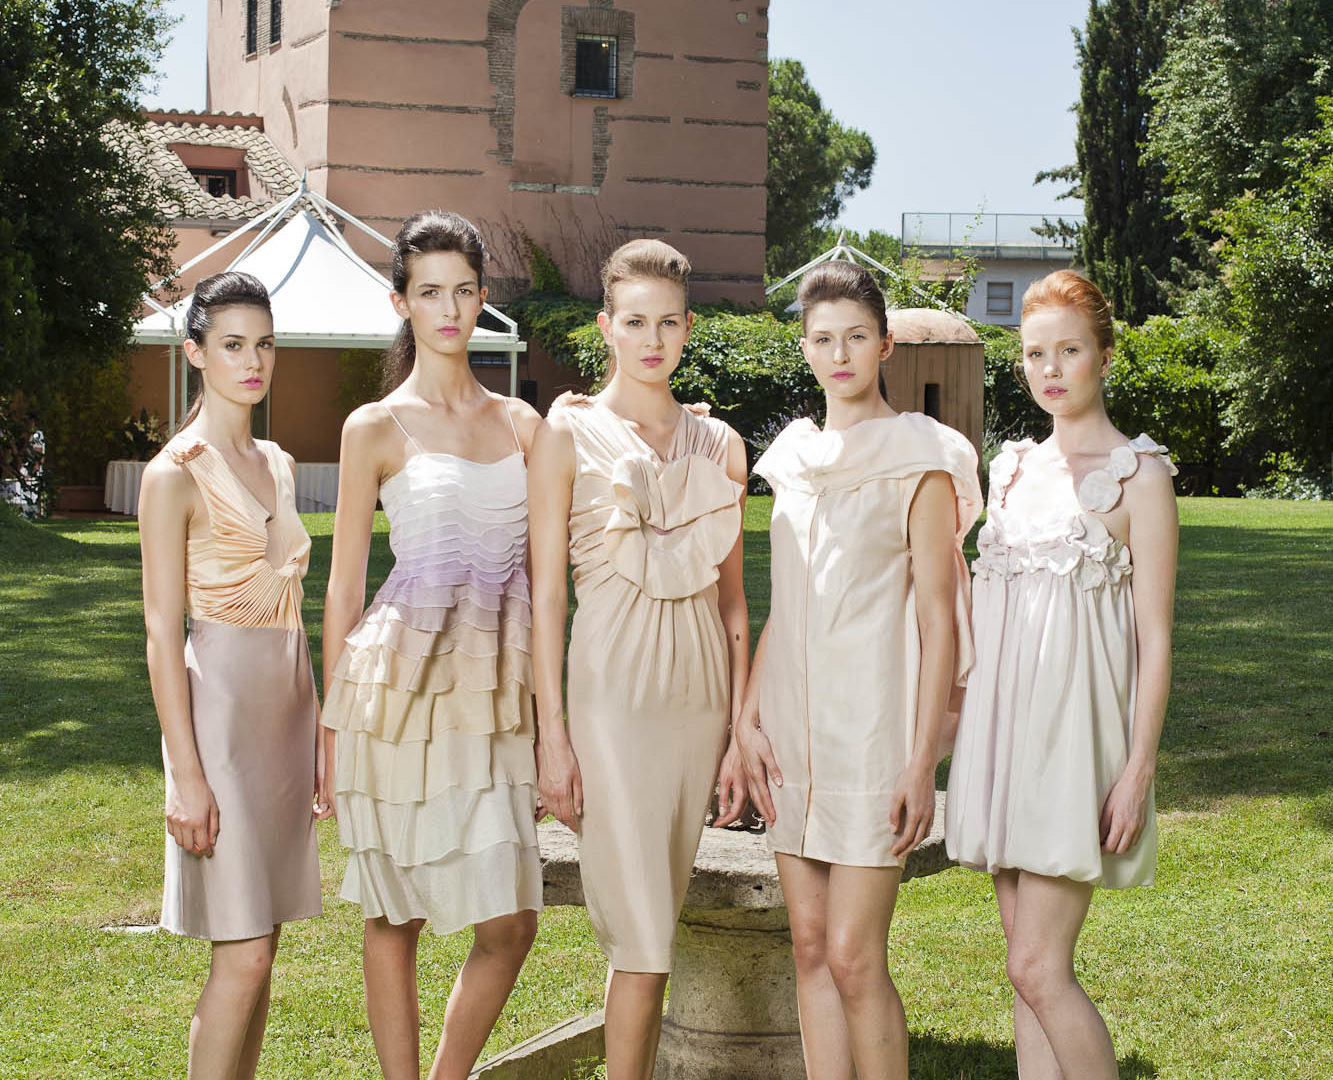 2011 - Dutch Touch Rome - Maryam Kordbacheh © Andiamo Services